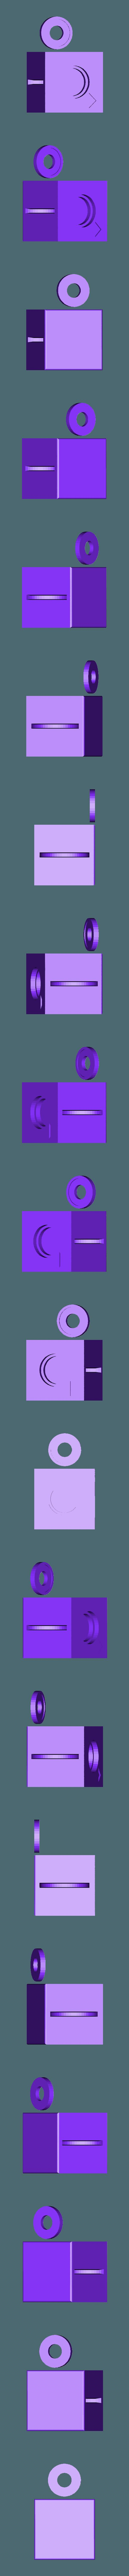 PennyPixelBlockArtHanger.stl Download free STL file 3D Penny-Powered Pixel Art Blocks - Video Game Art • Model to 3D print, tonyyoungblood